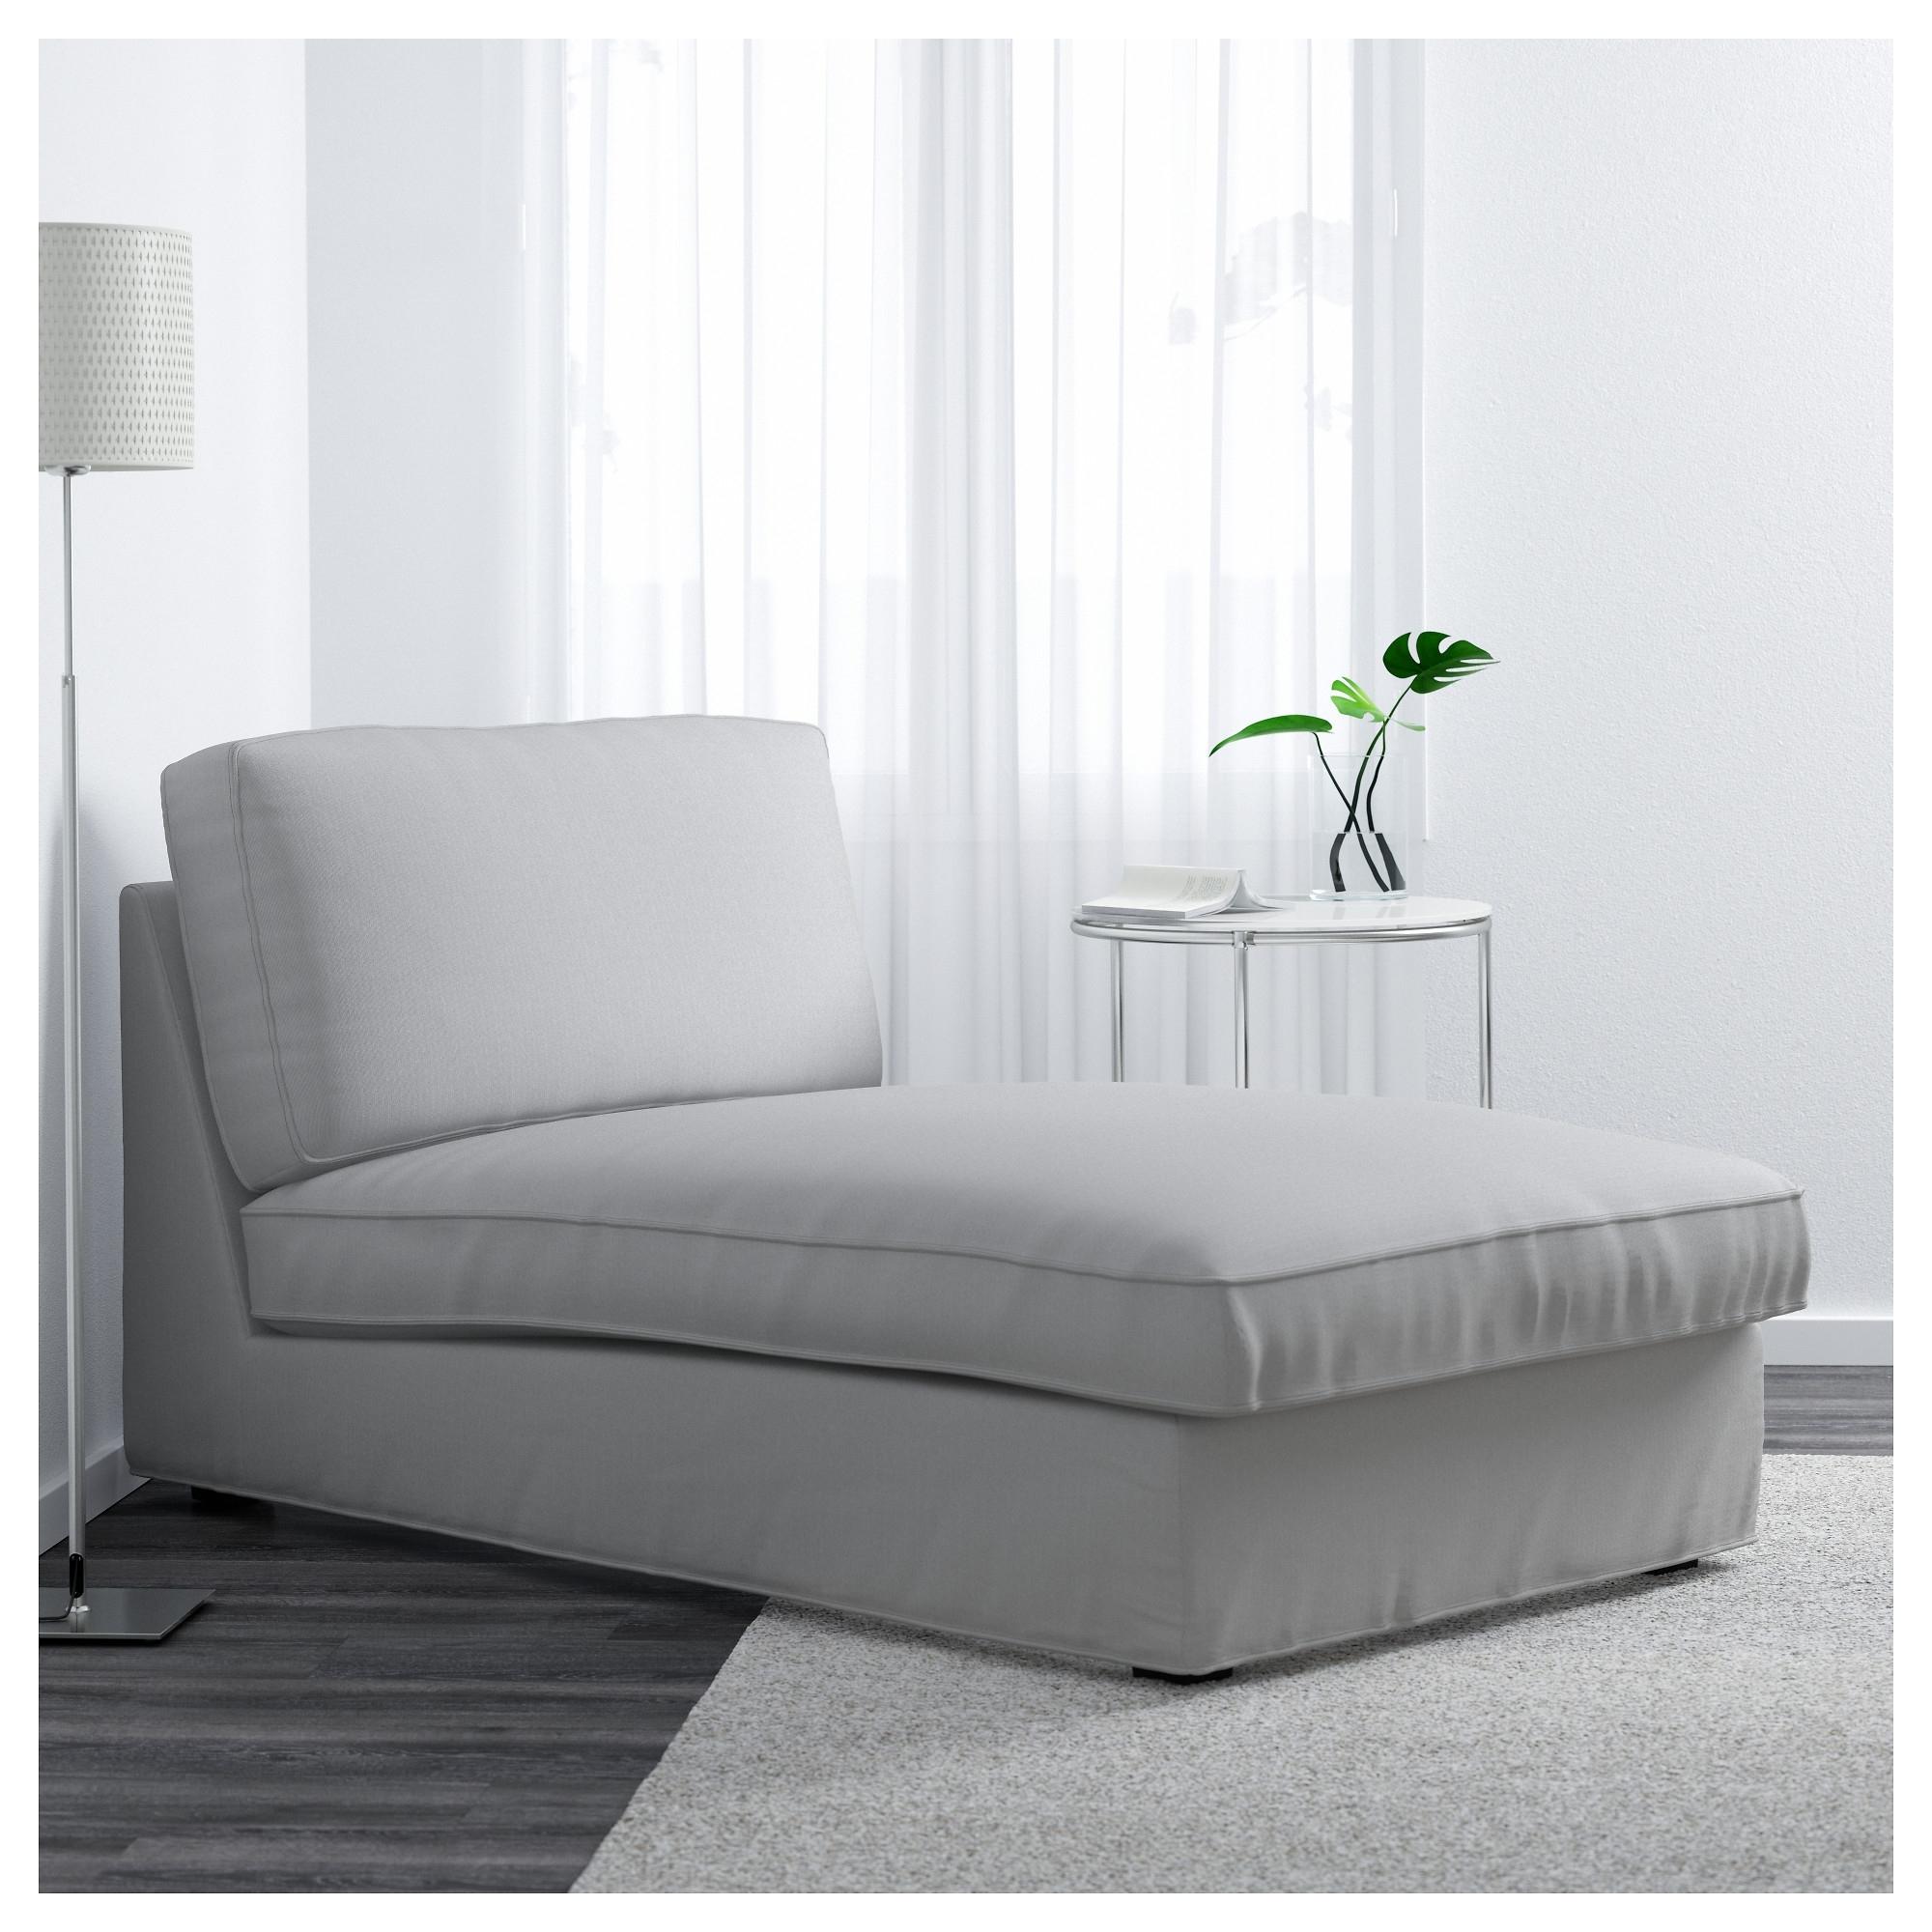 Recent Kivik Chaise Longue Ramna Light Grey – Ikea Regarding Ikea Chaise Lounge Chairs (View 4 of 15)